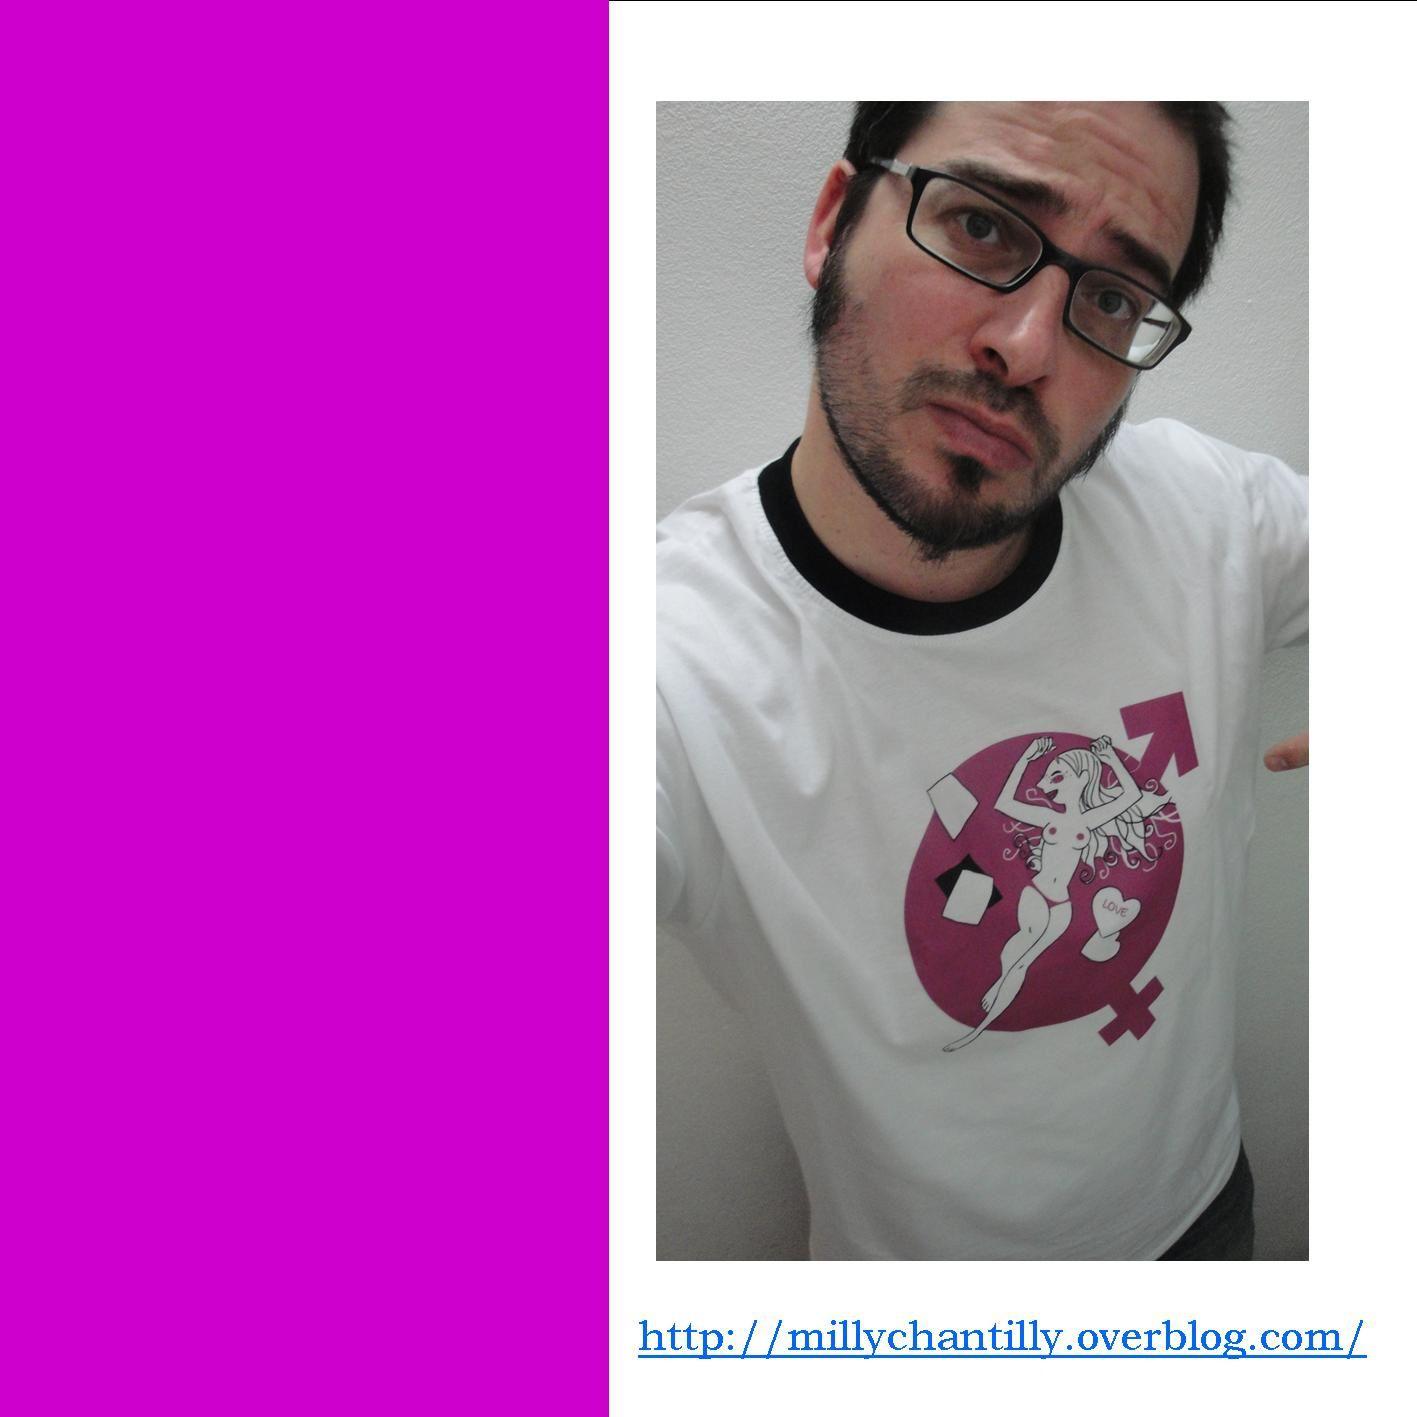 Mickael et t.shirt